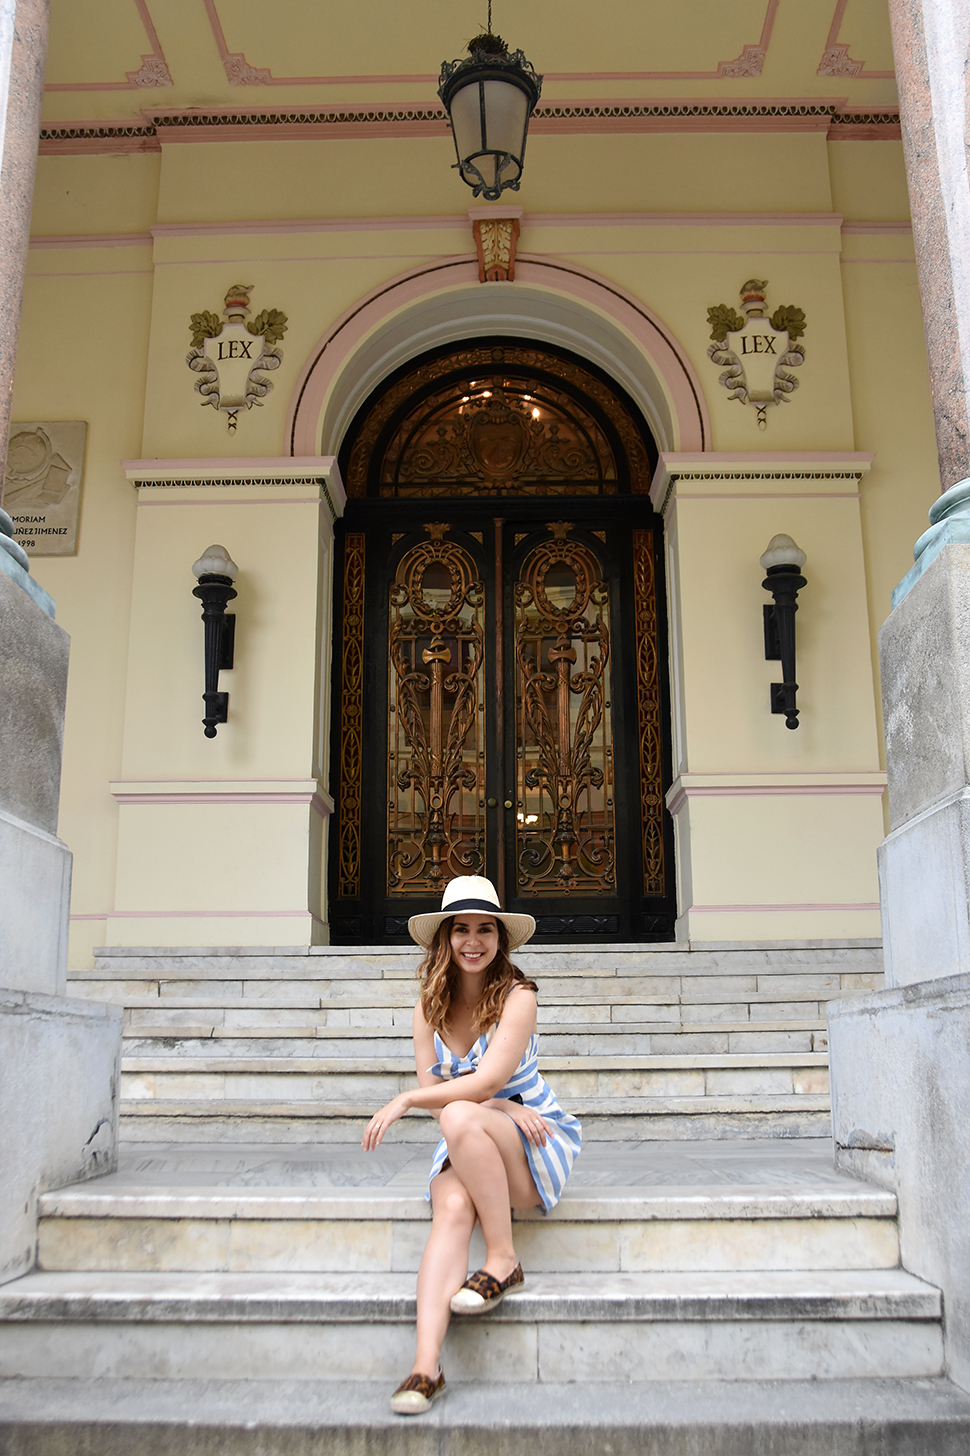 Helloitsvalentine_Cuba_LaHabana_63